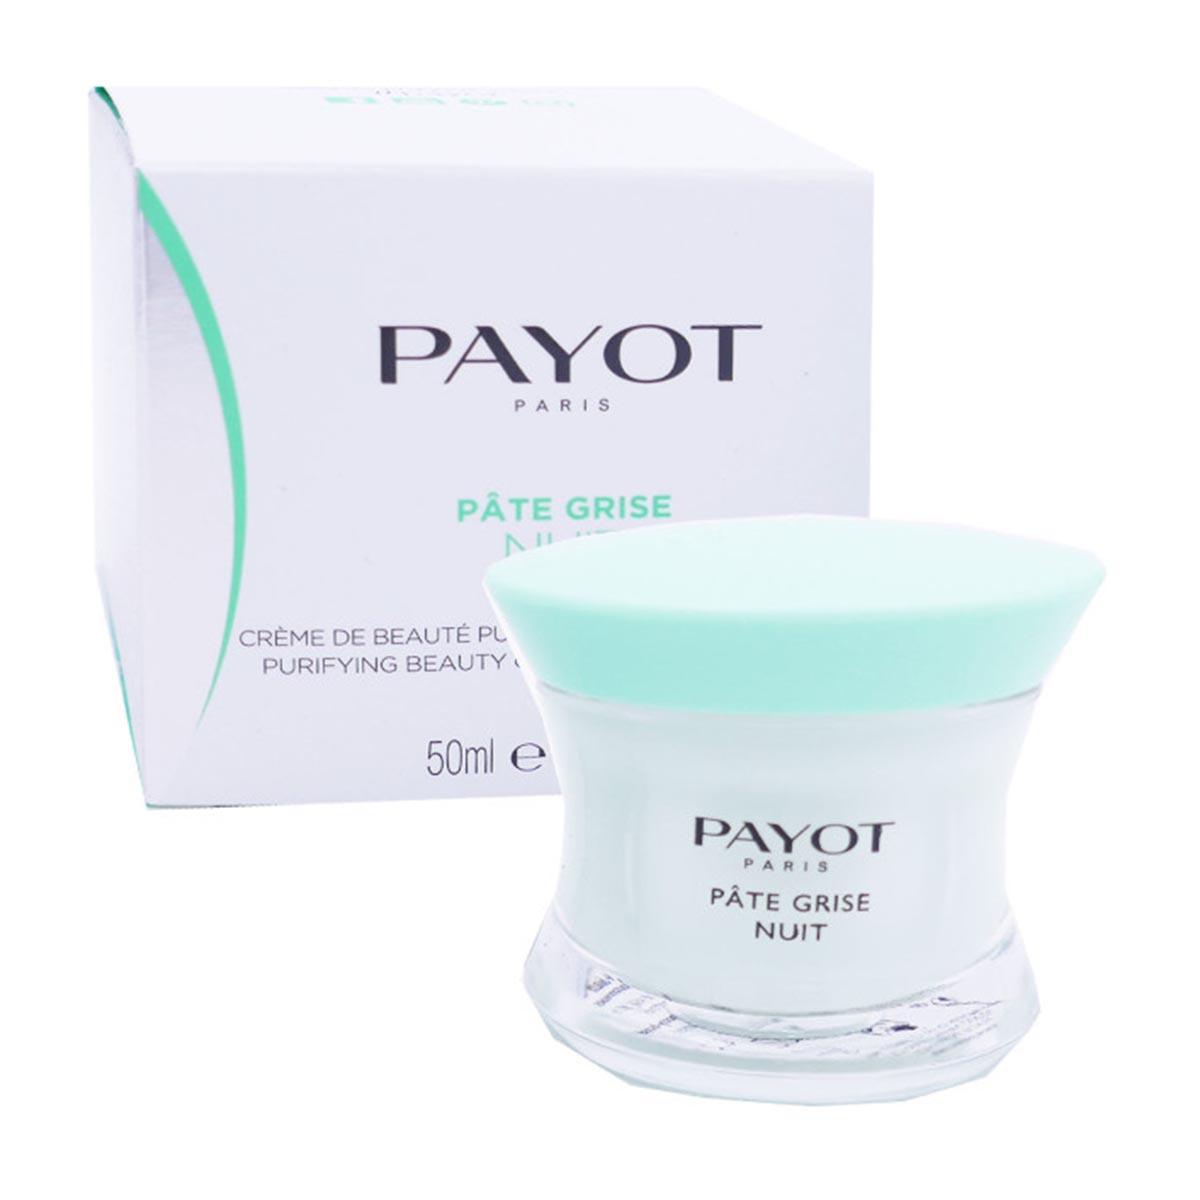 Payot pate grise jour night 50ml - BellezaMagica.com